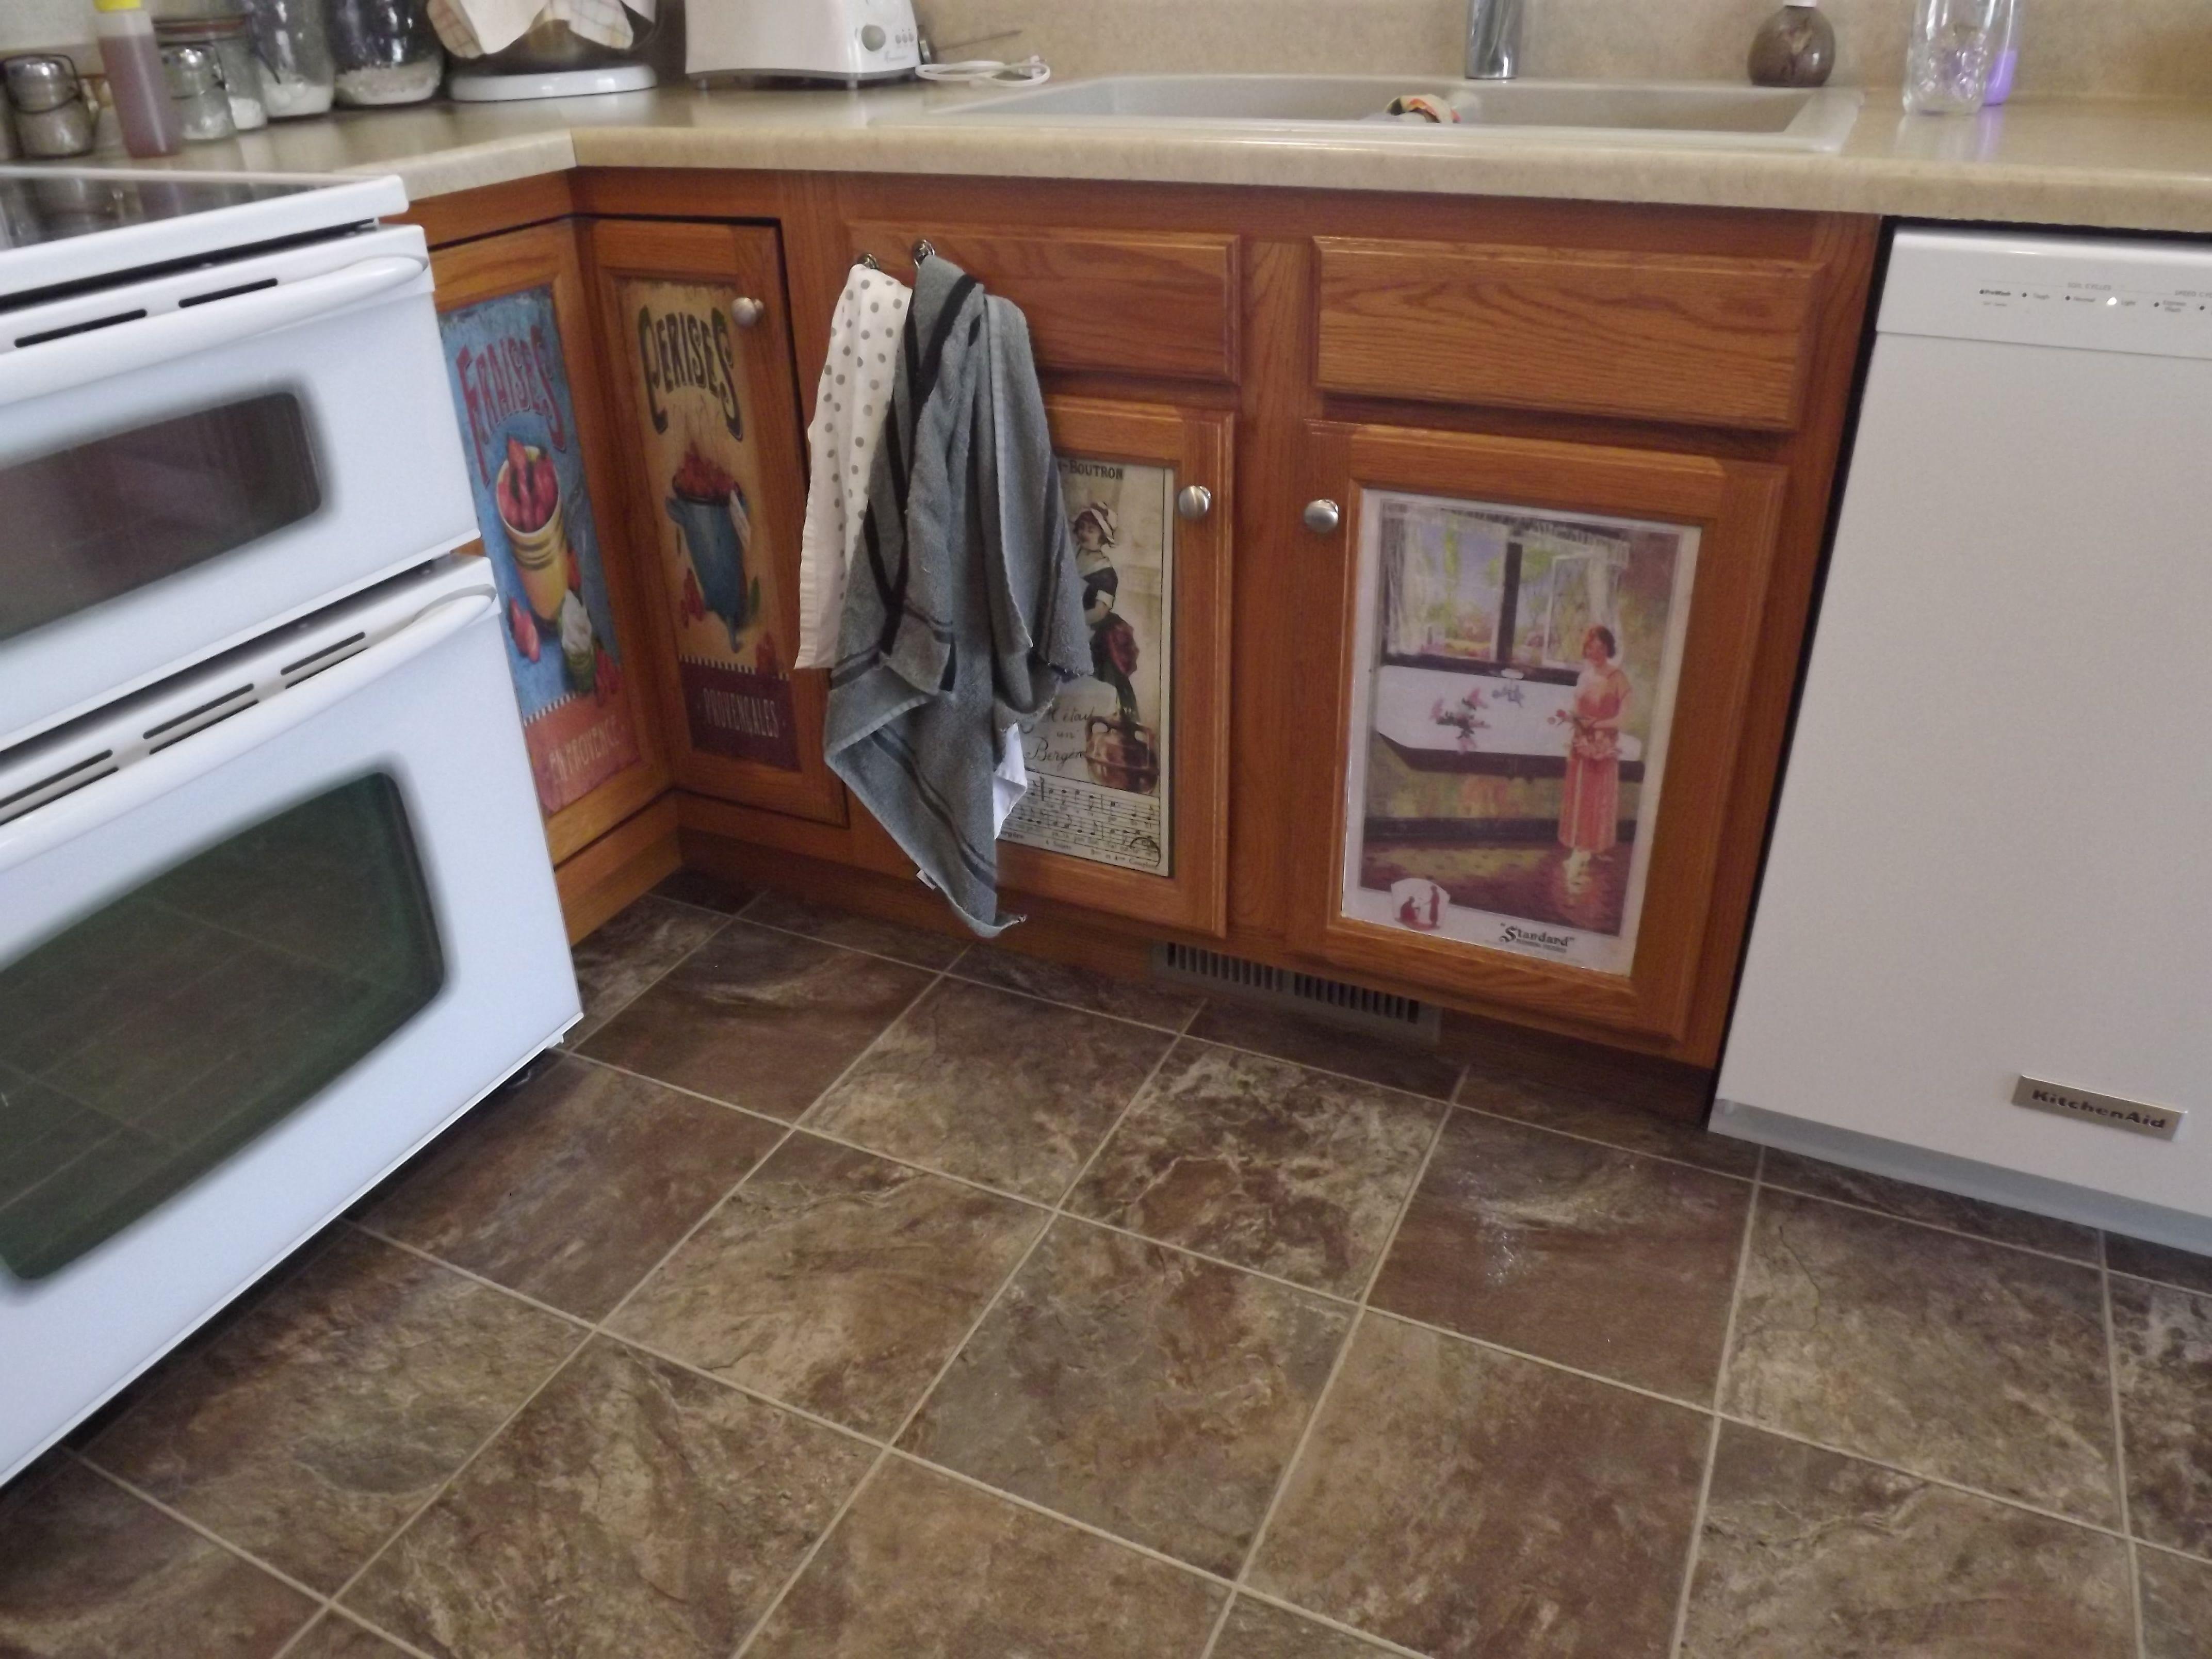 Decoupage On Kitchen Cubboard Doors House Interior Home Interior Design Kitchen